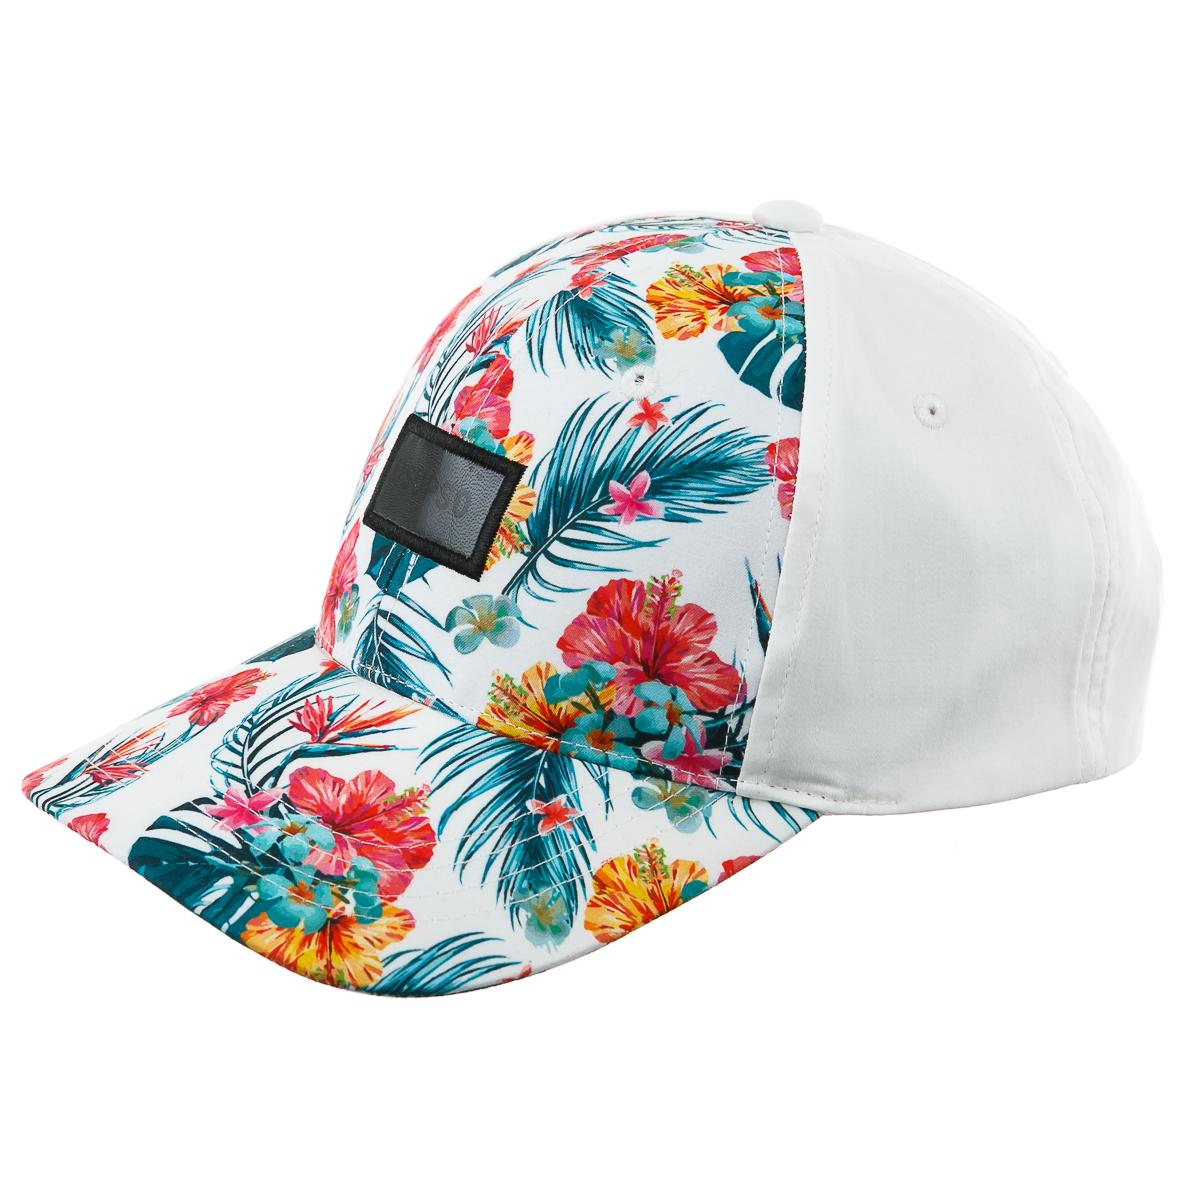 Кепка белая с яркими цветами